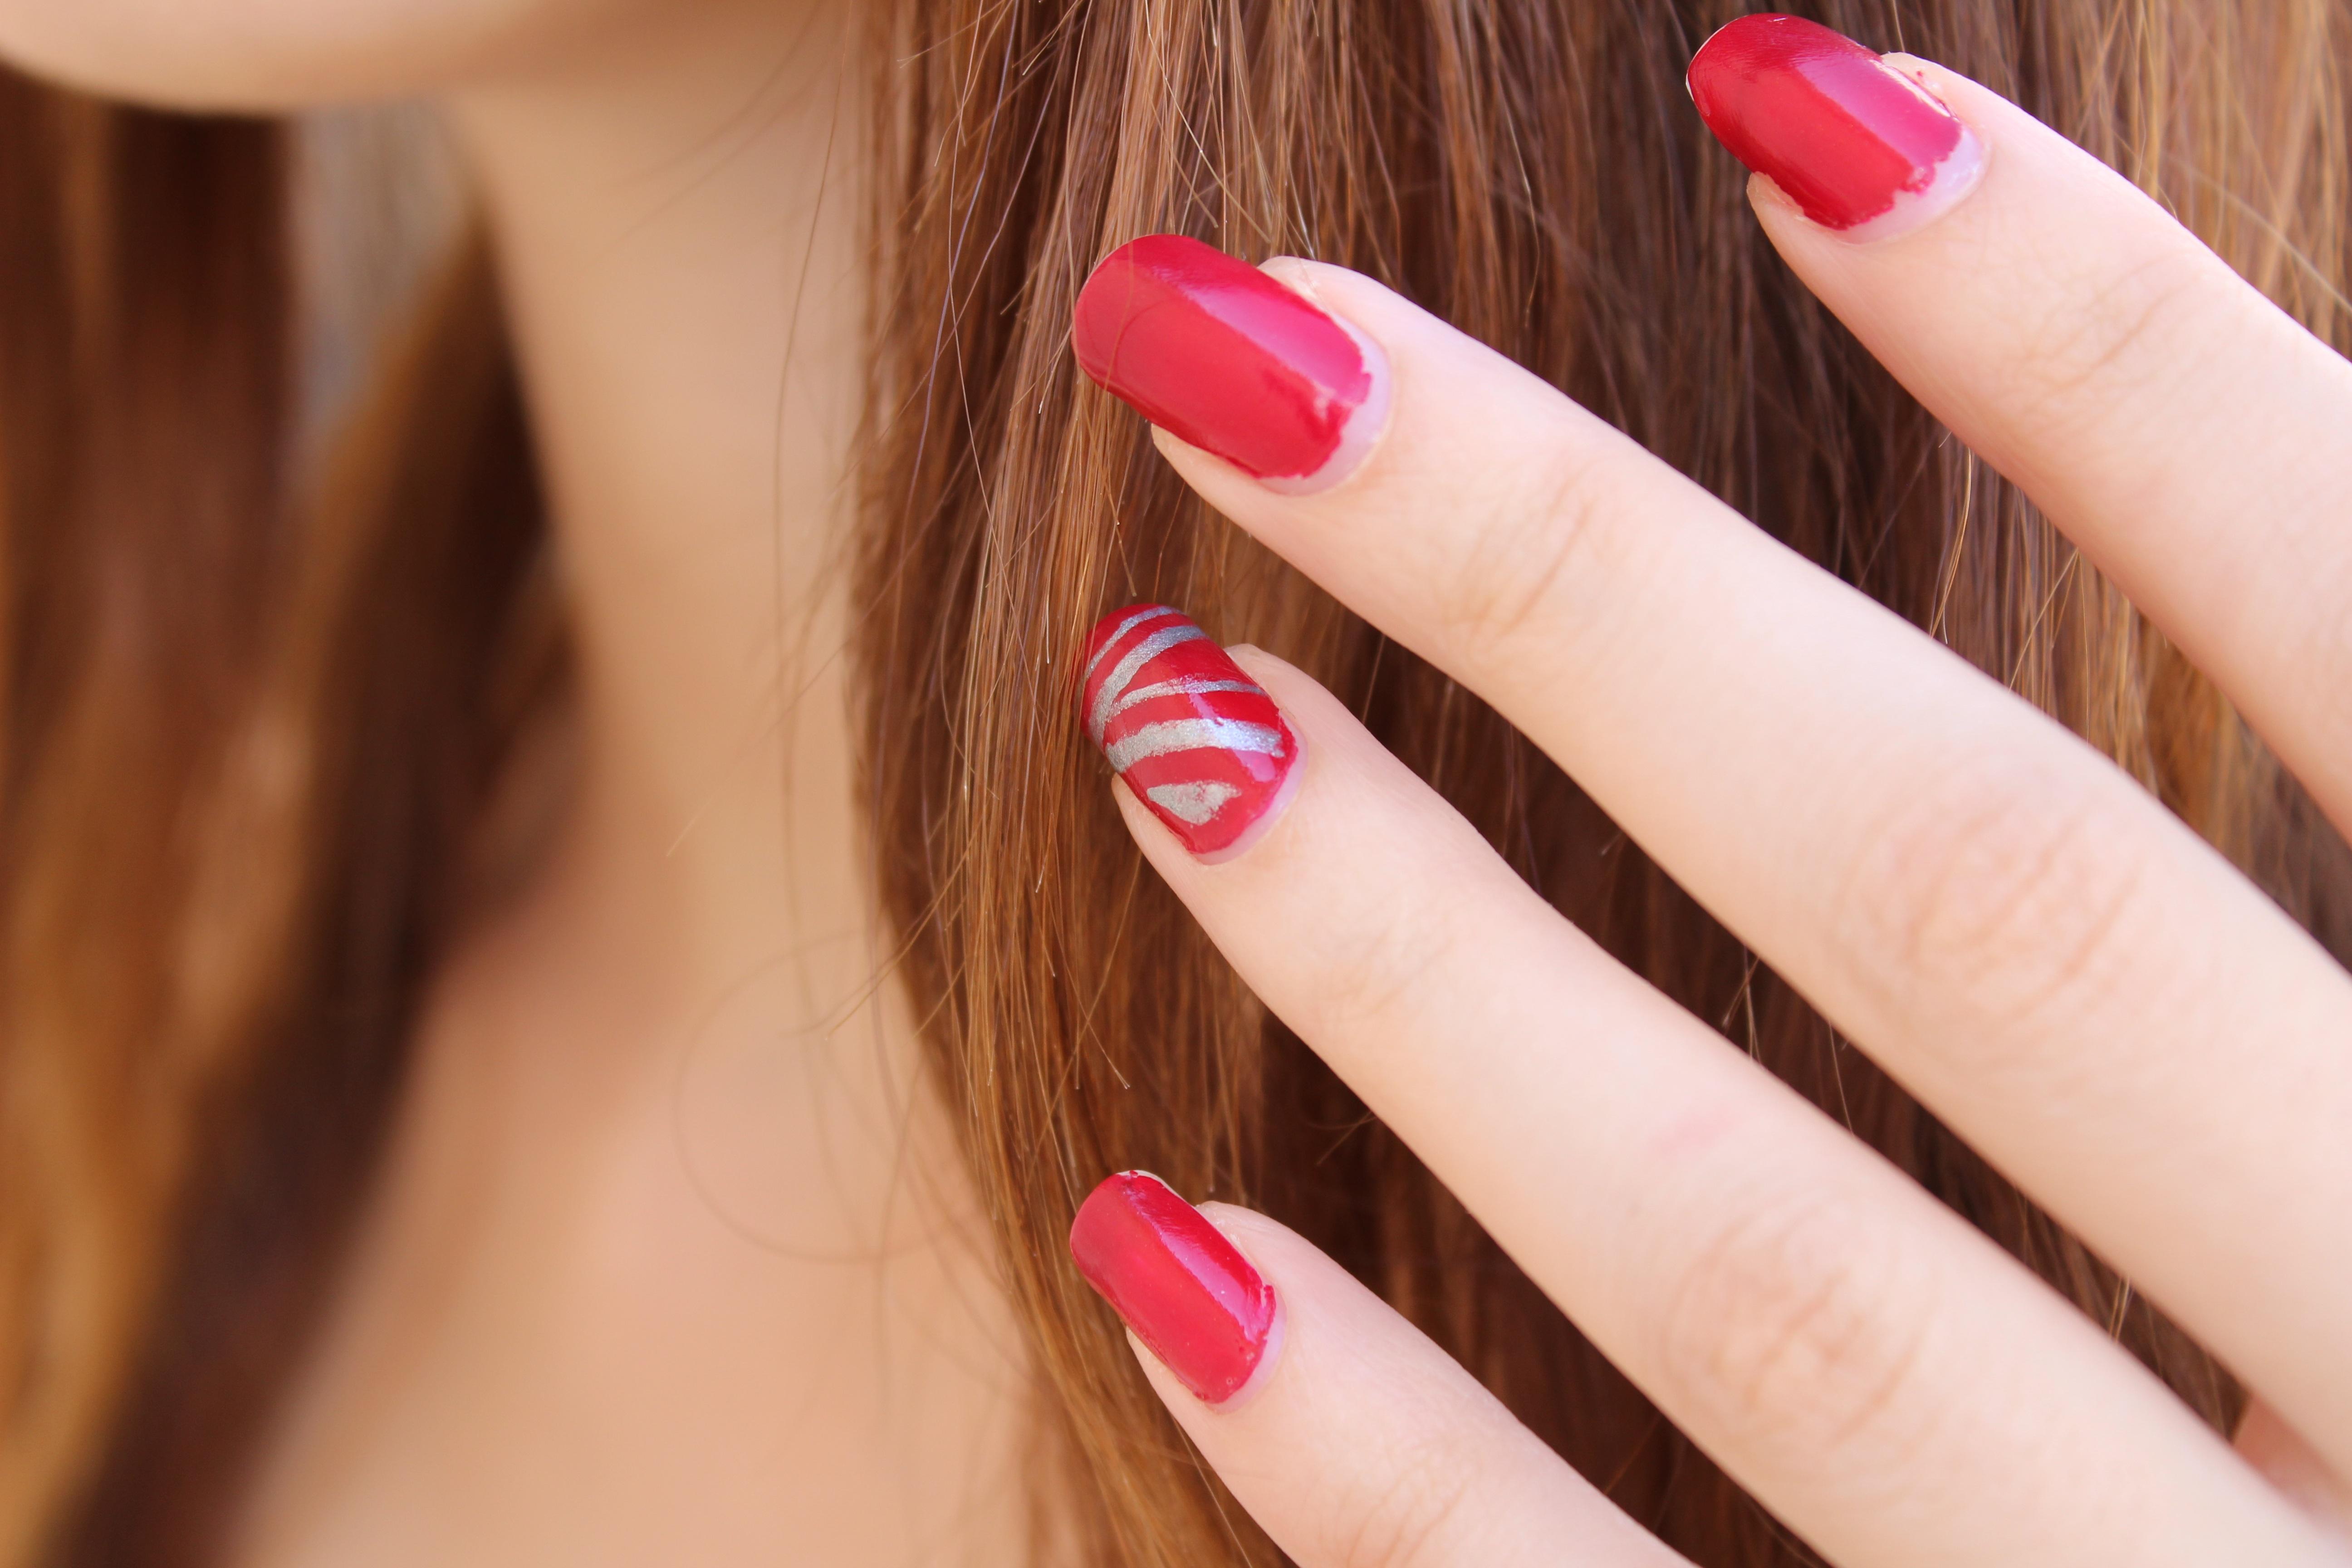 Fotos gratis : mano, cabello, hembra, dedo, rojo, color, humano ...